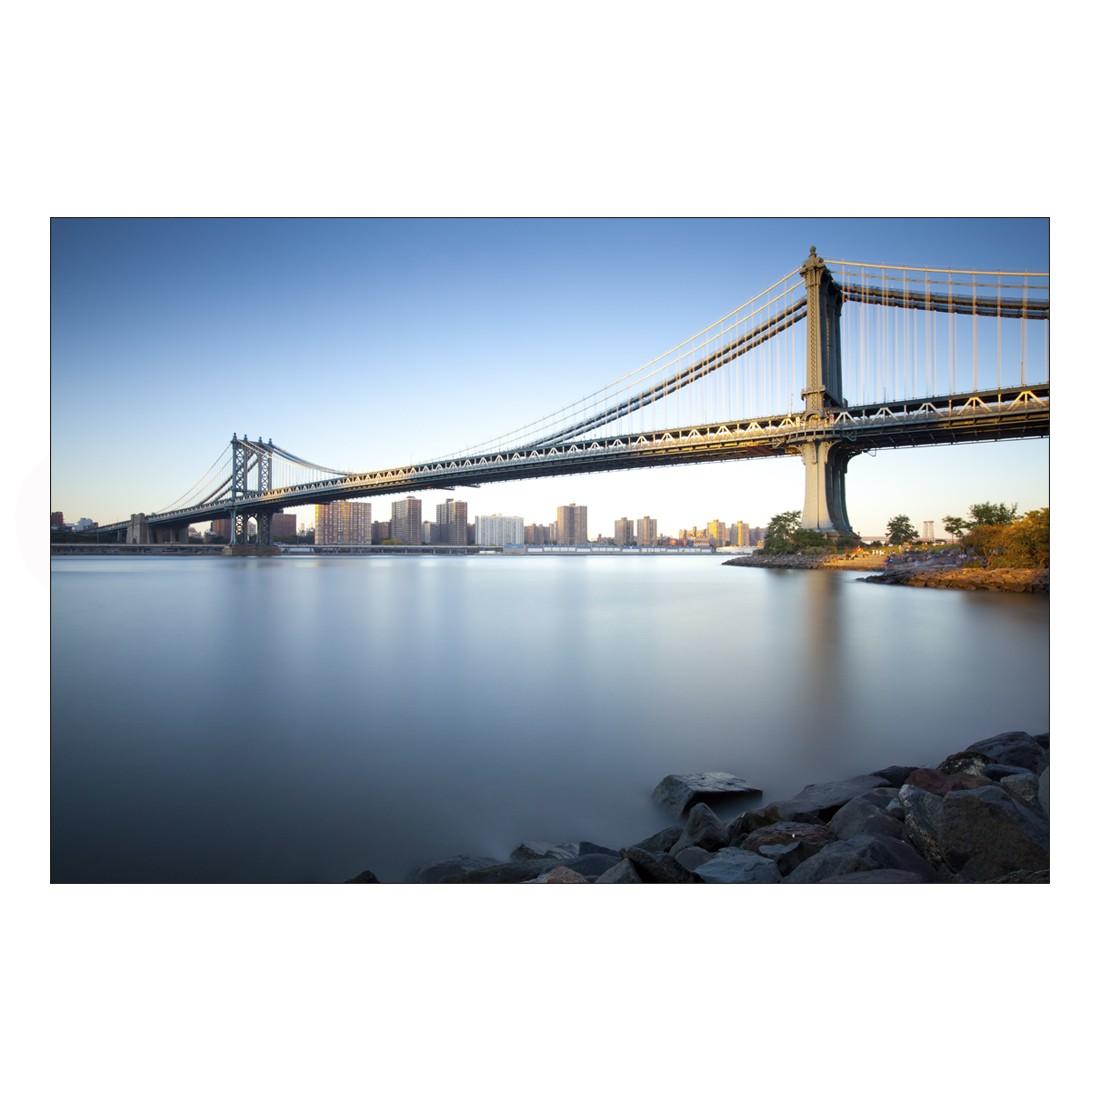 Acrylglasbild Bridge in Sunlight – Abmessung 30×20 cm, Gallery of Innovative Art online kaufen